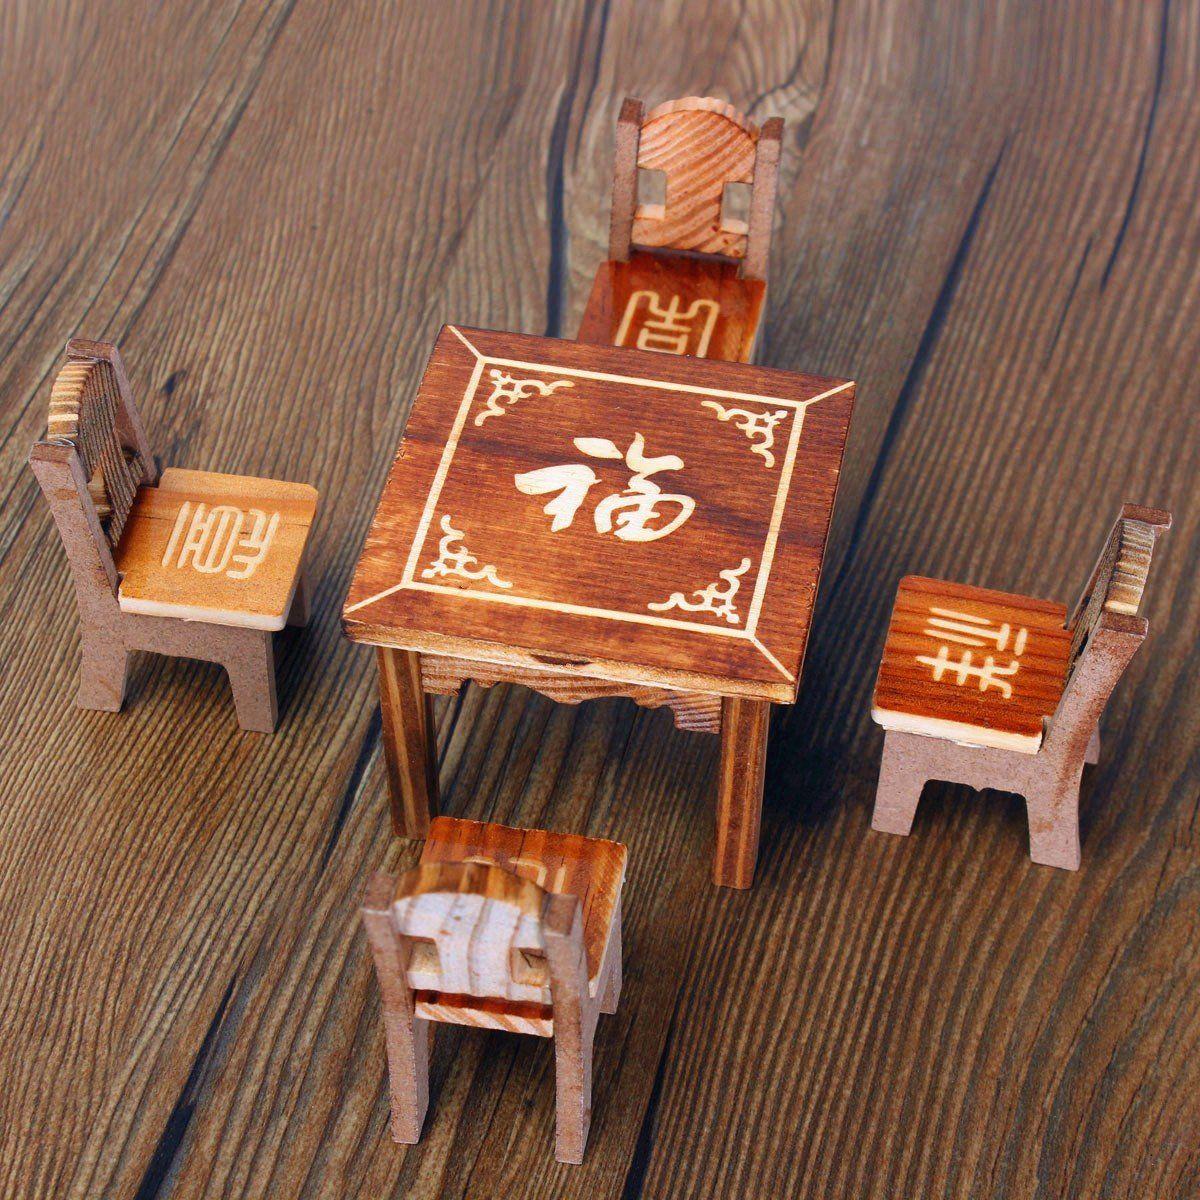 BARGAIN HOUSE Miniature Table Miniature Chair Mini Furniture Miniature  Furniture Set Wooden Furniture Set Applies To ...